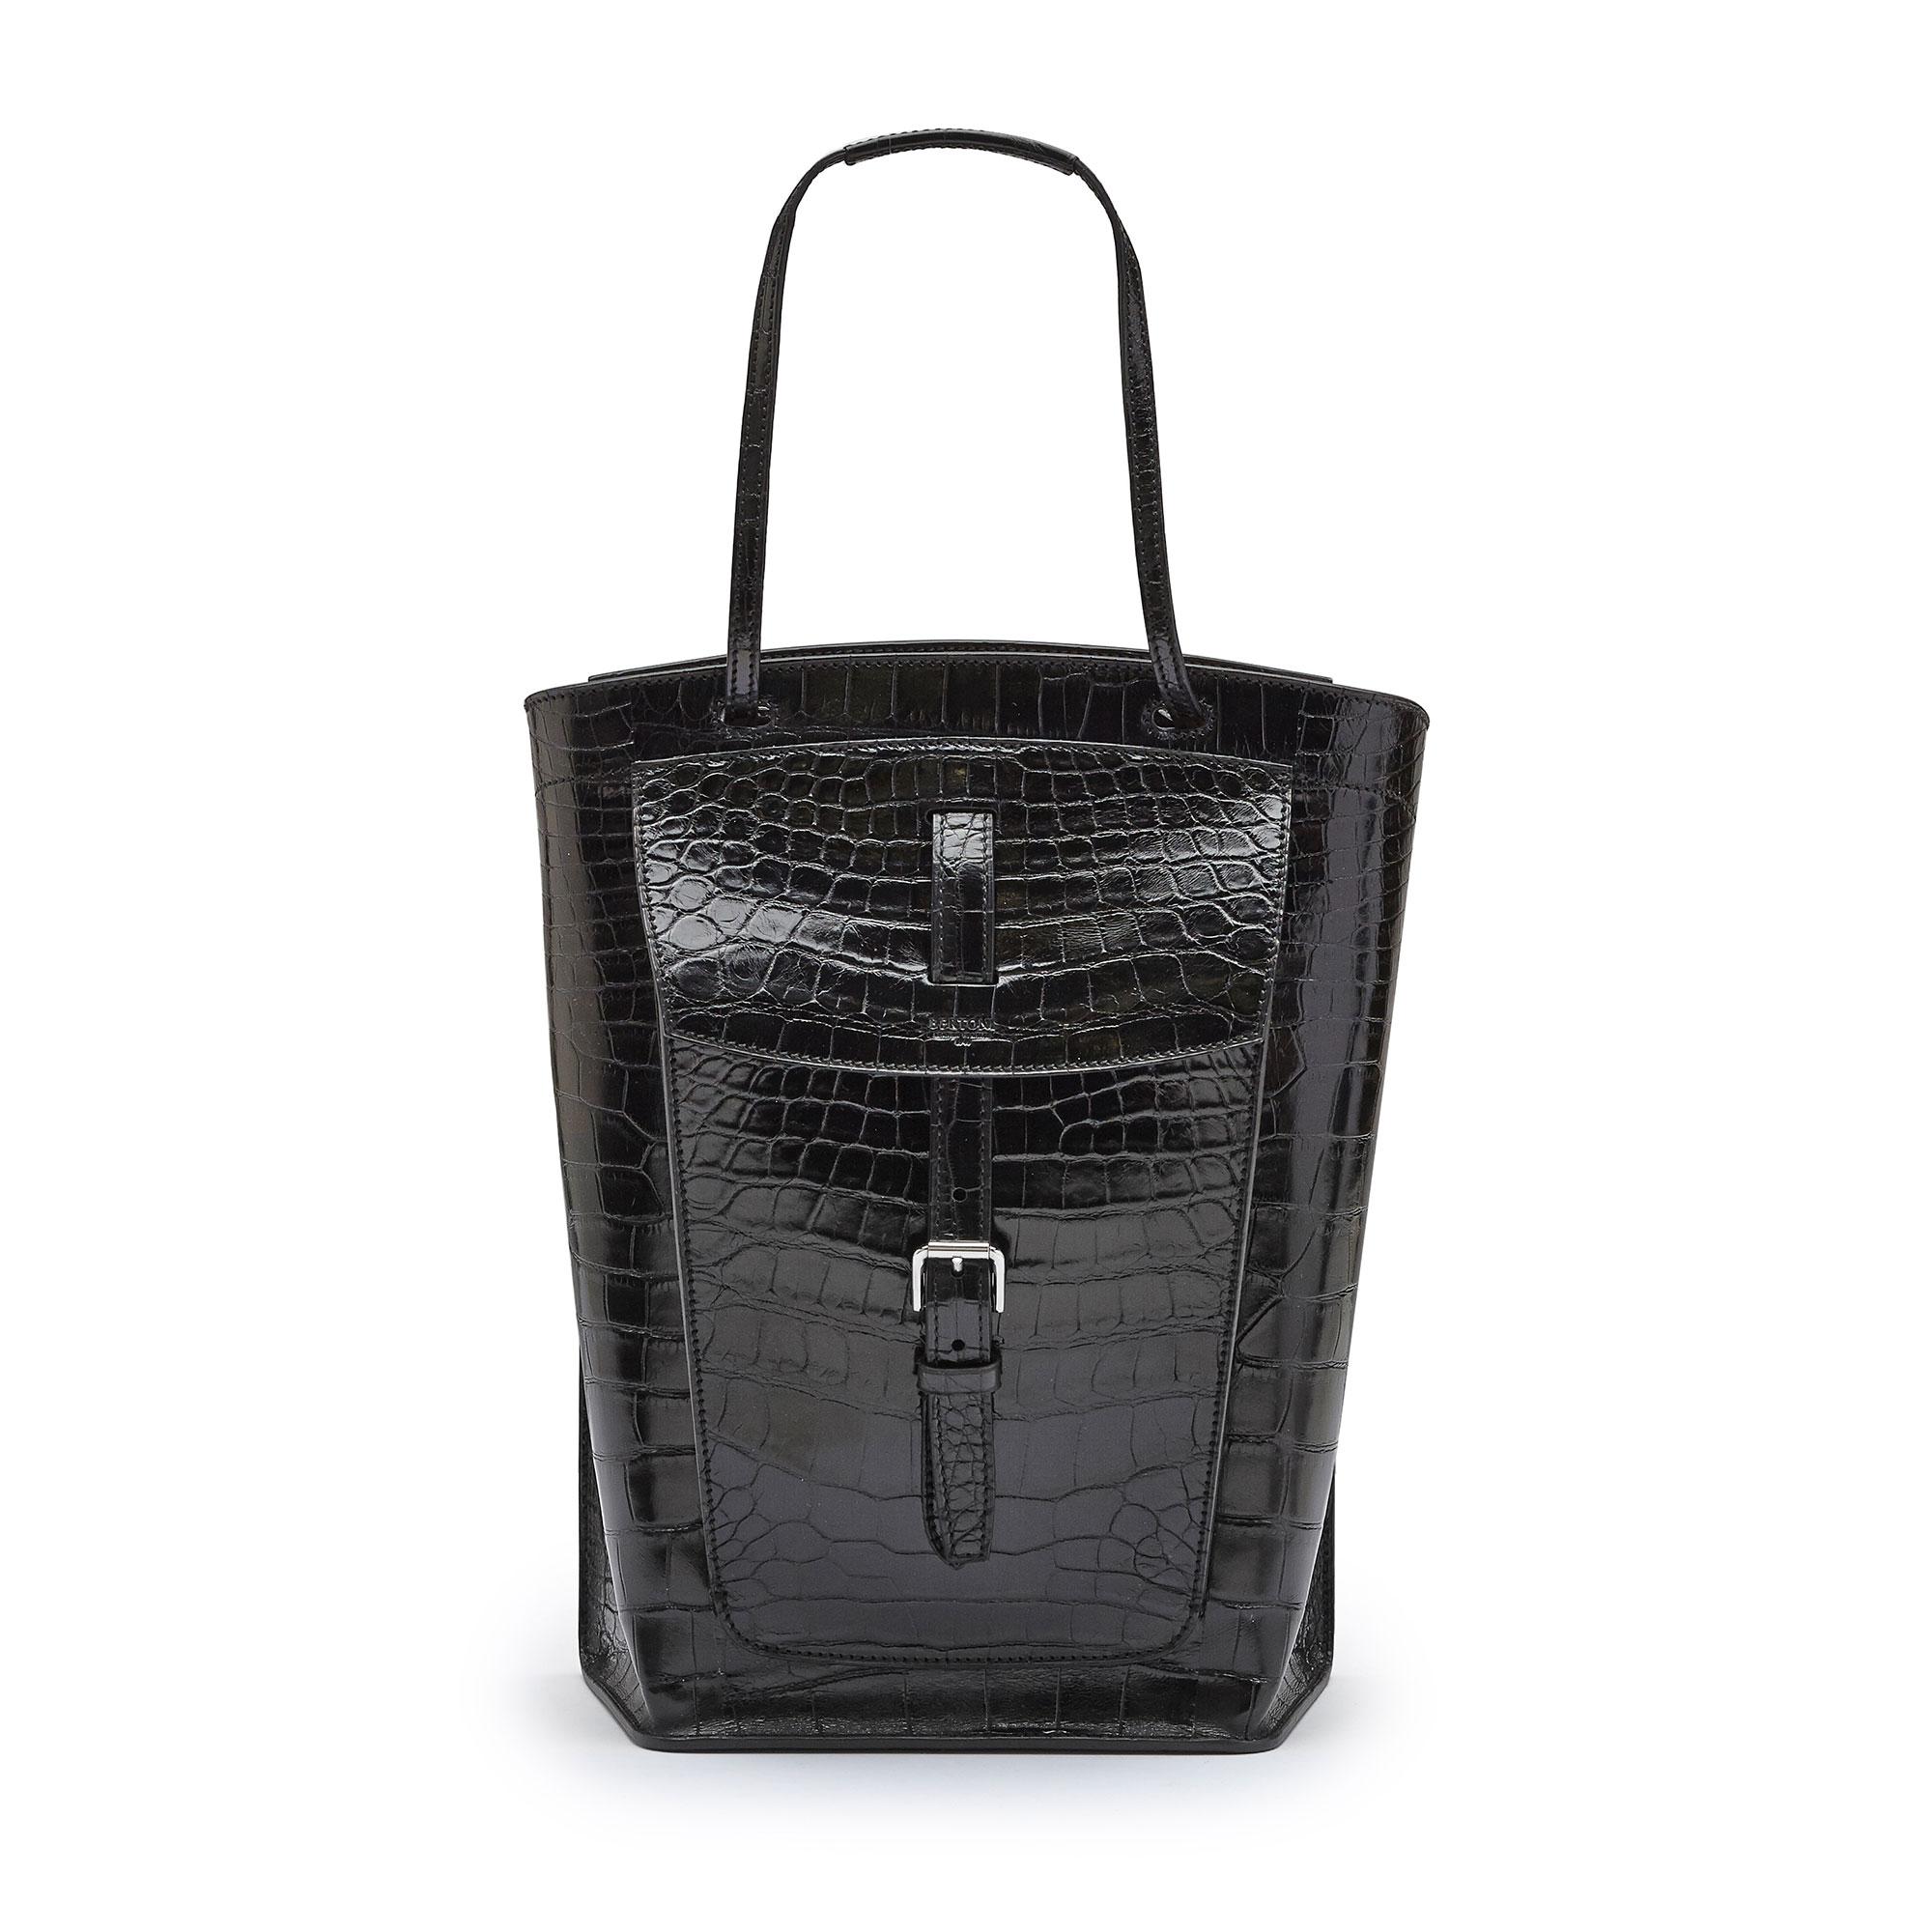 The black alligator Arizona bucket bag by Bertoni 1949 01